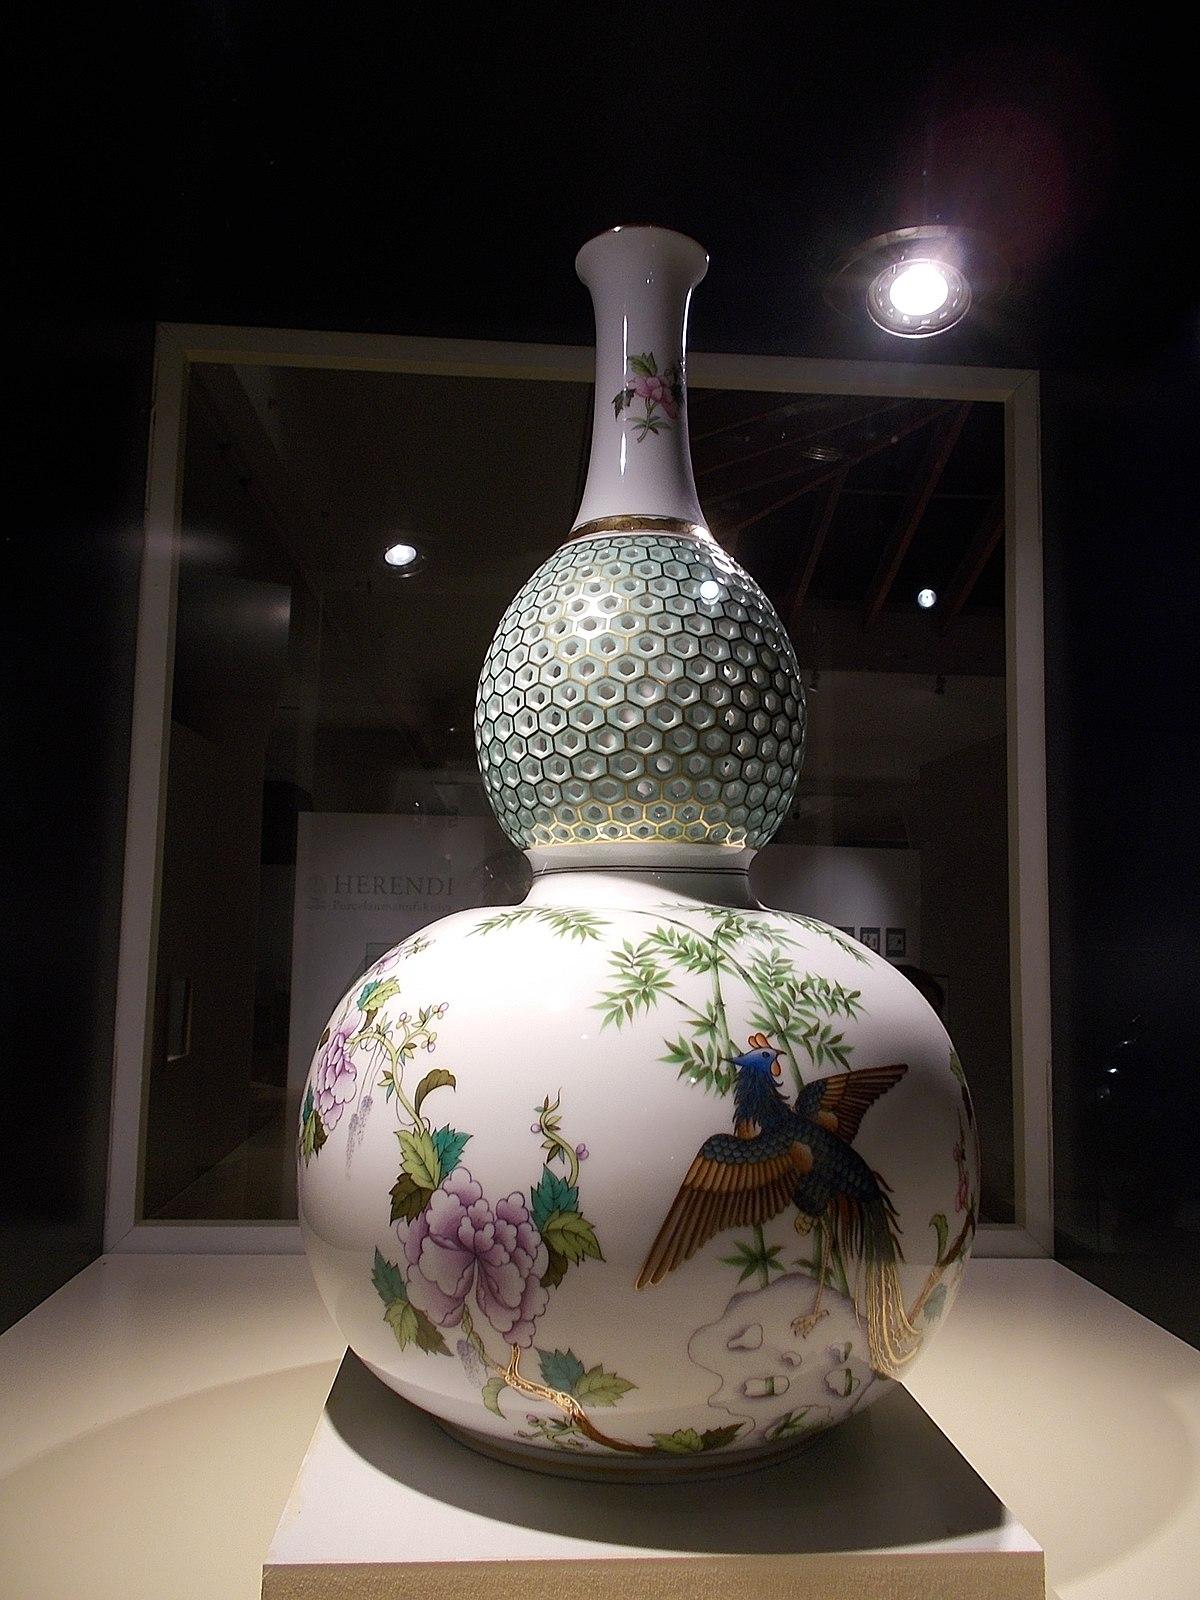 Herend Porcelain Manufactory Wikipedia